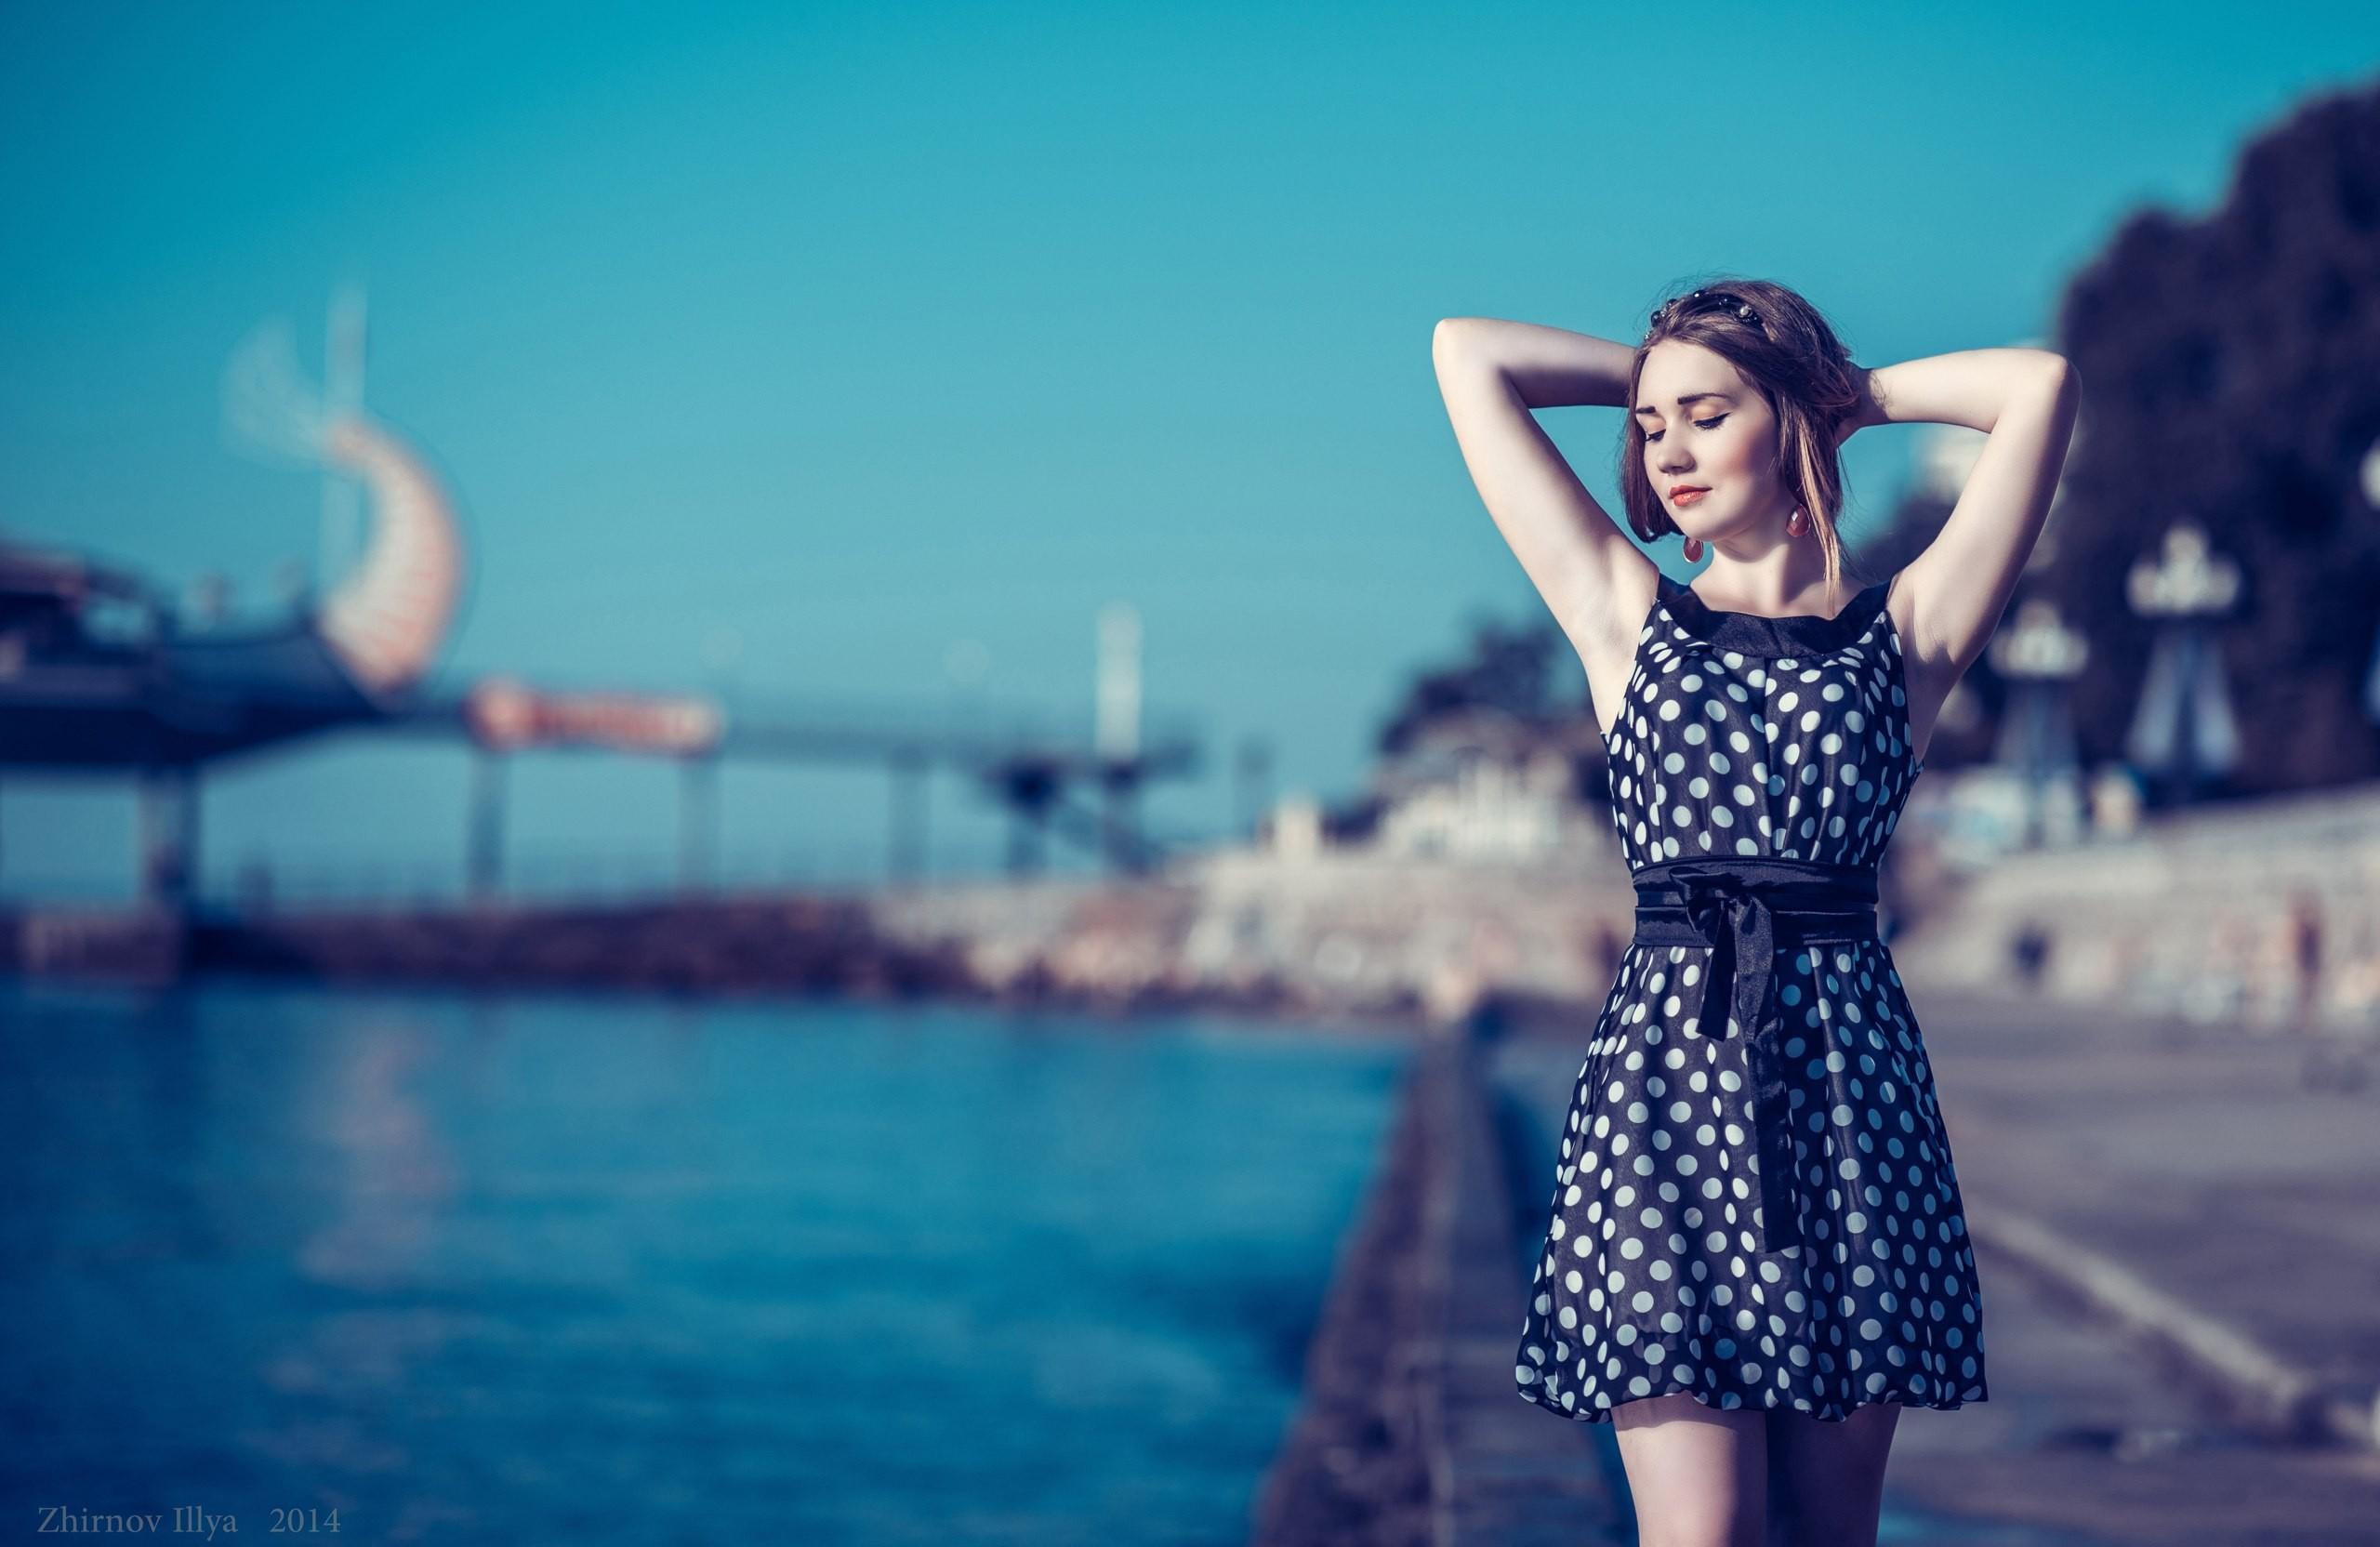 23de252bdf women outdoors women model brunette photography dress blue fashion summer  dress polka dots Ilya Zhirnov girl